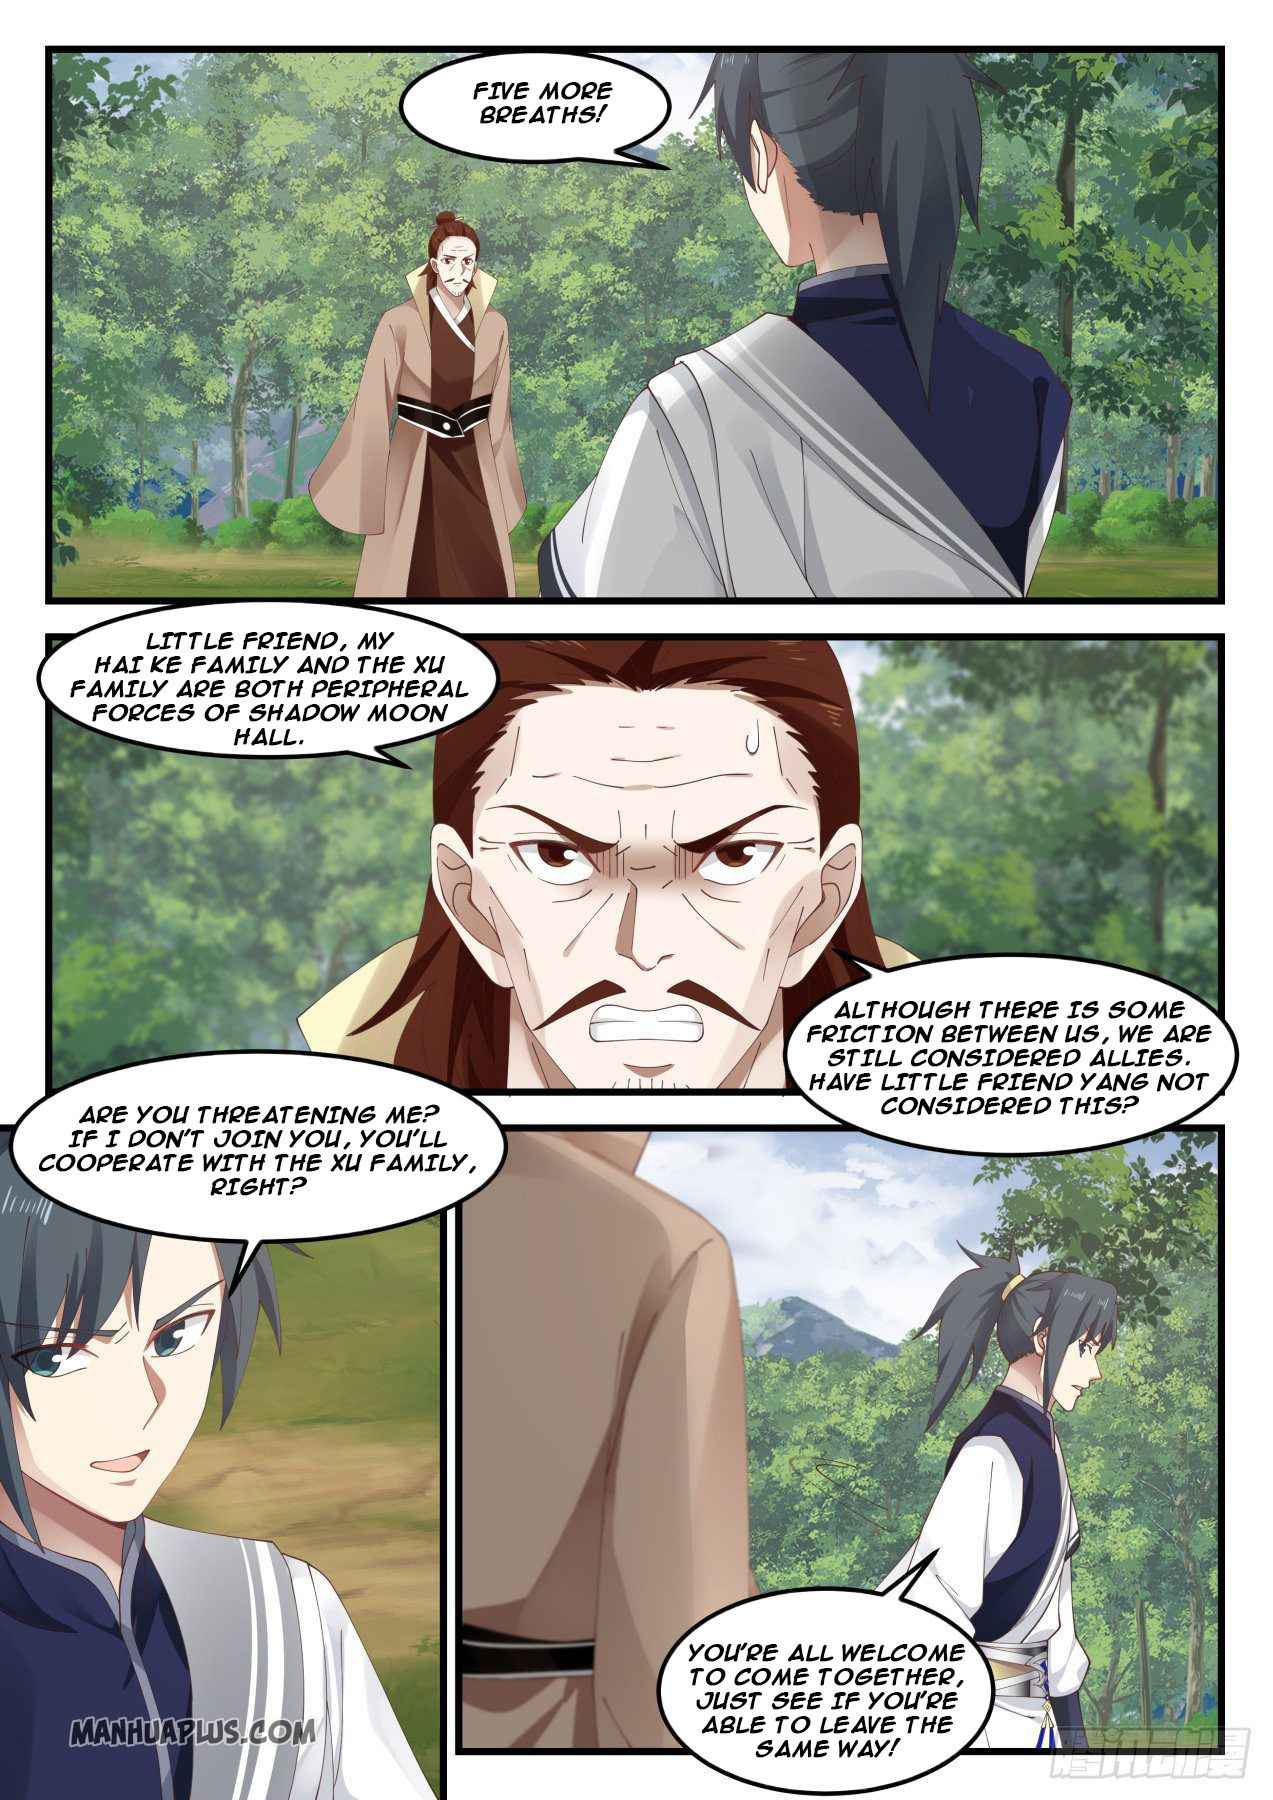 Martial Peak - chapter 1025-eng-li